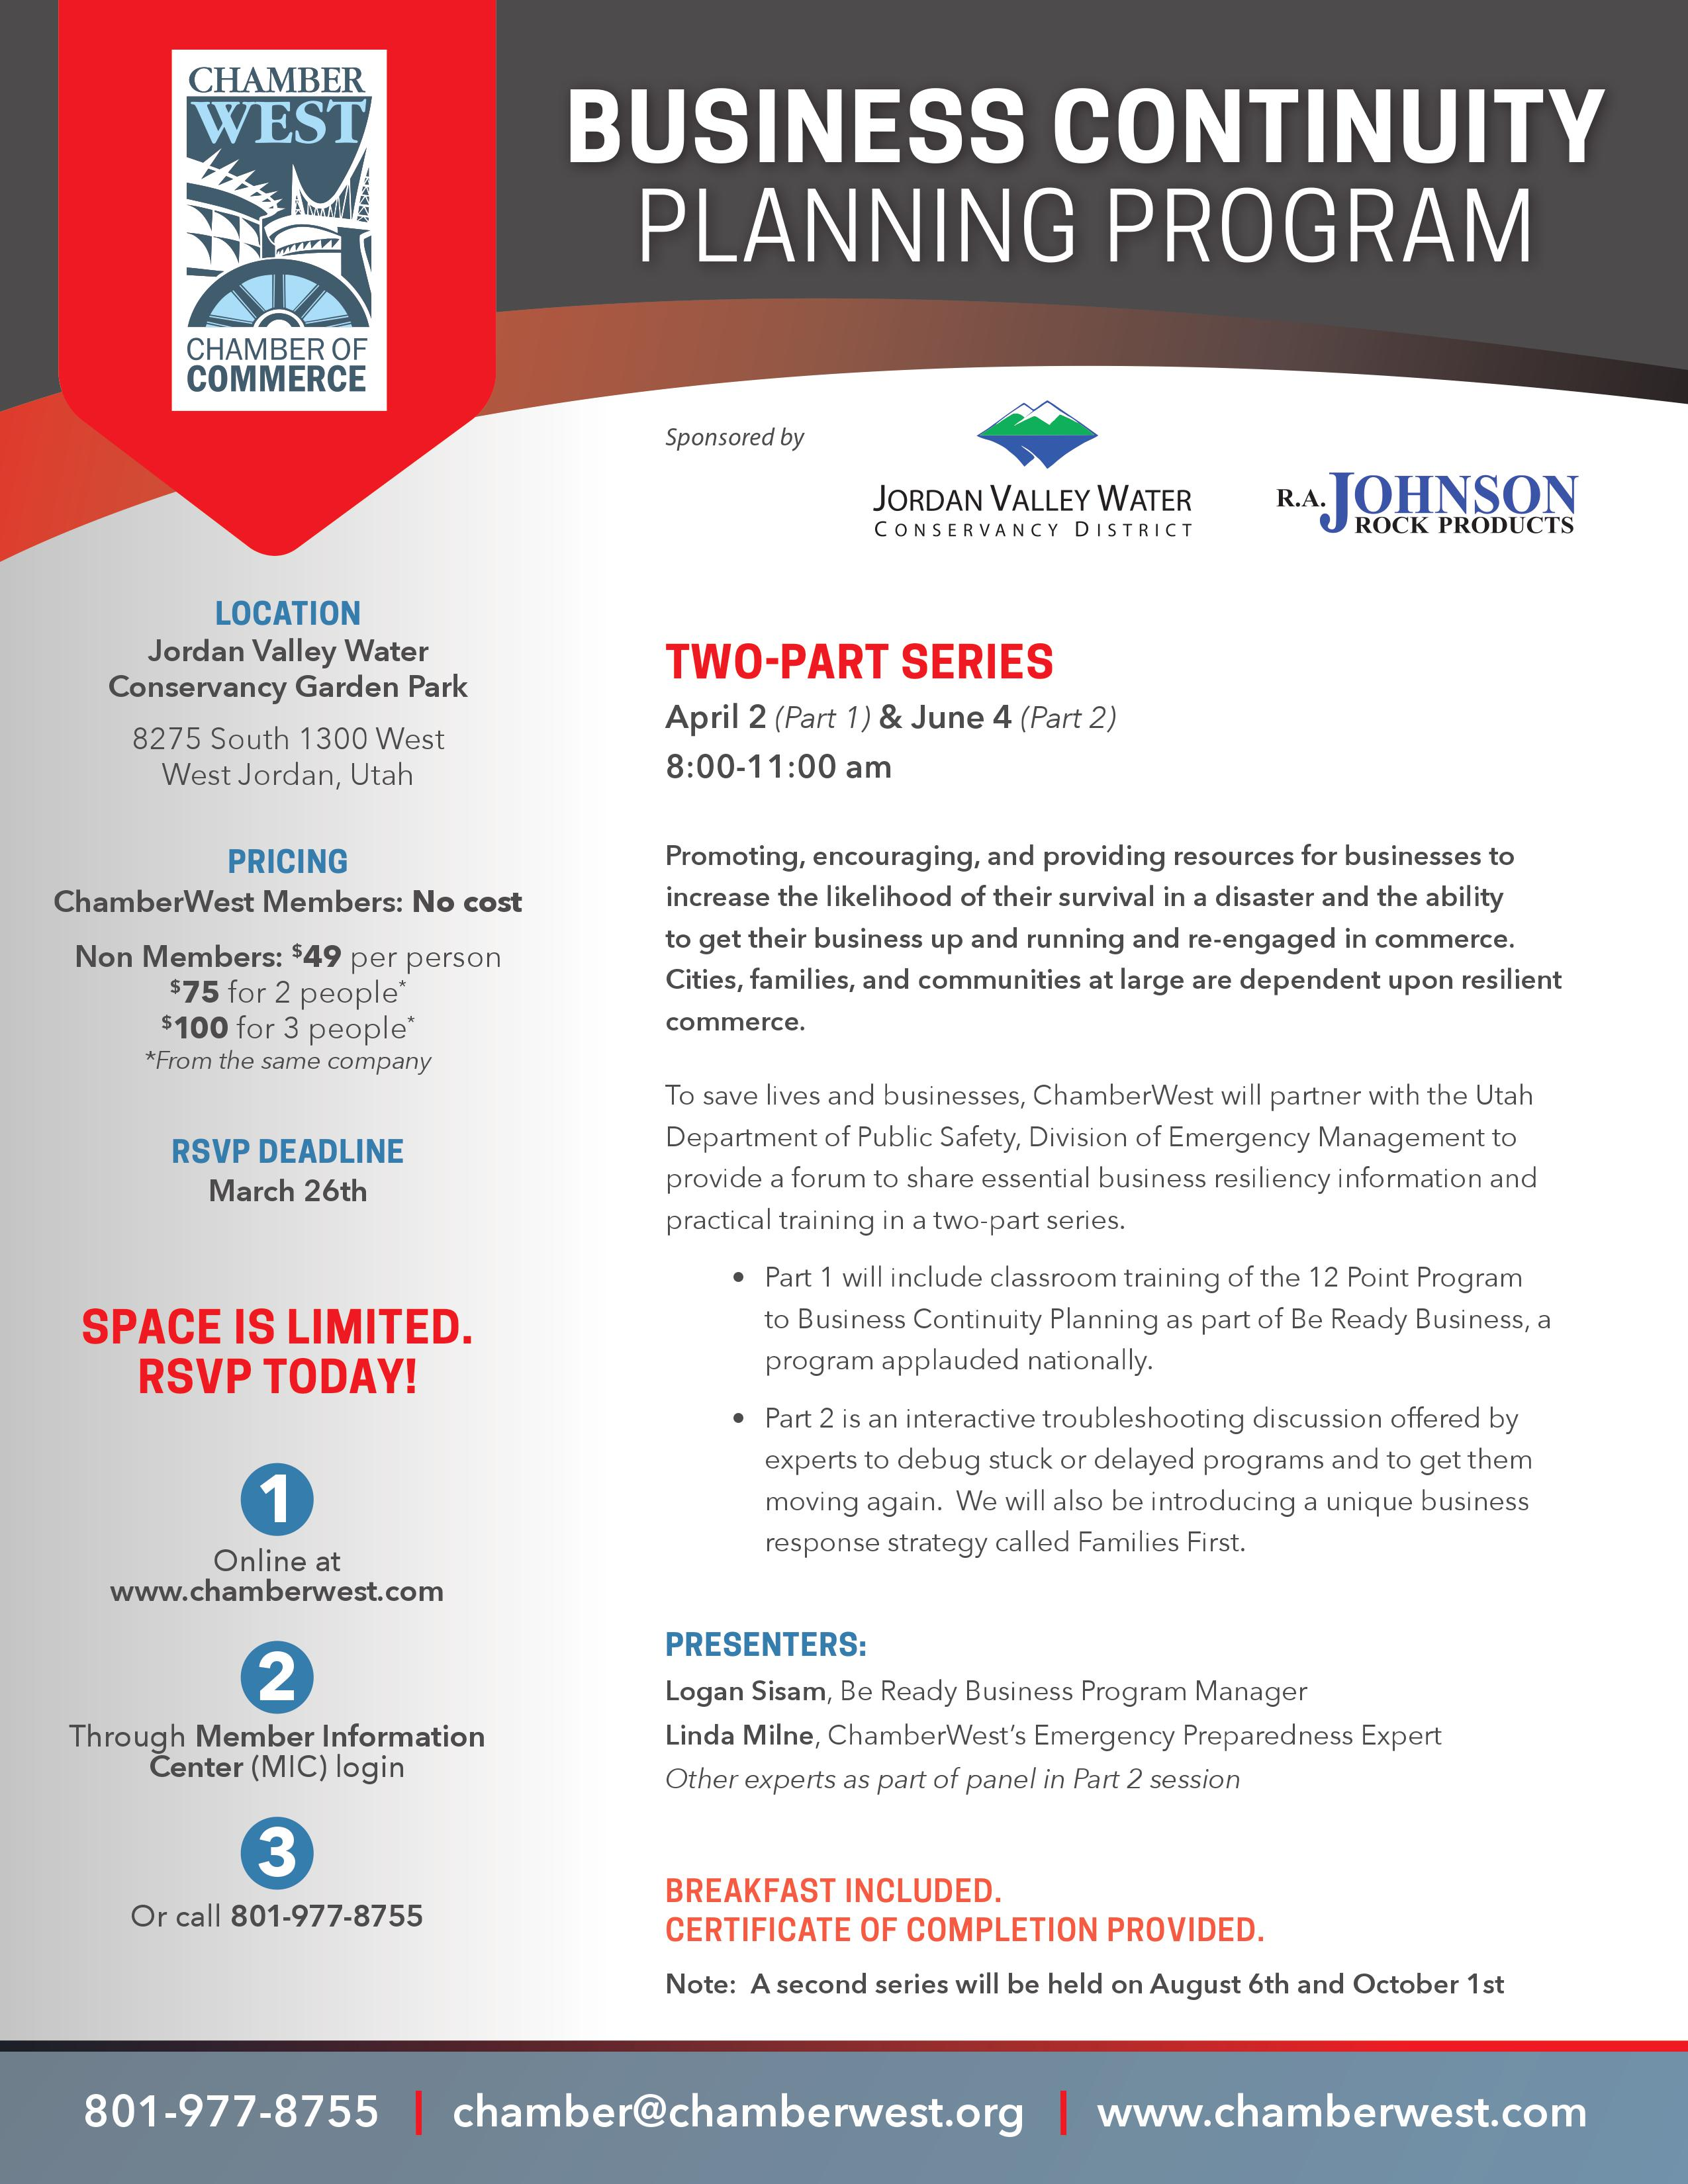 Business-Continuity-Planning-Program-Flyer.jpg